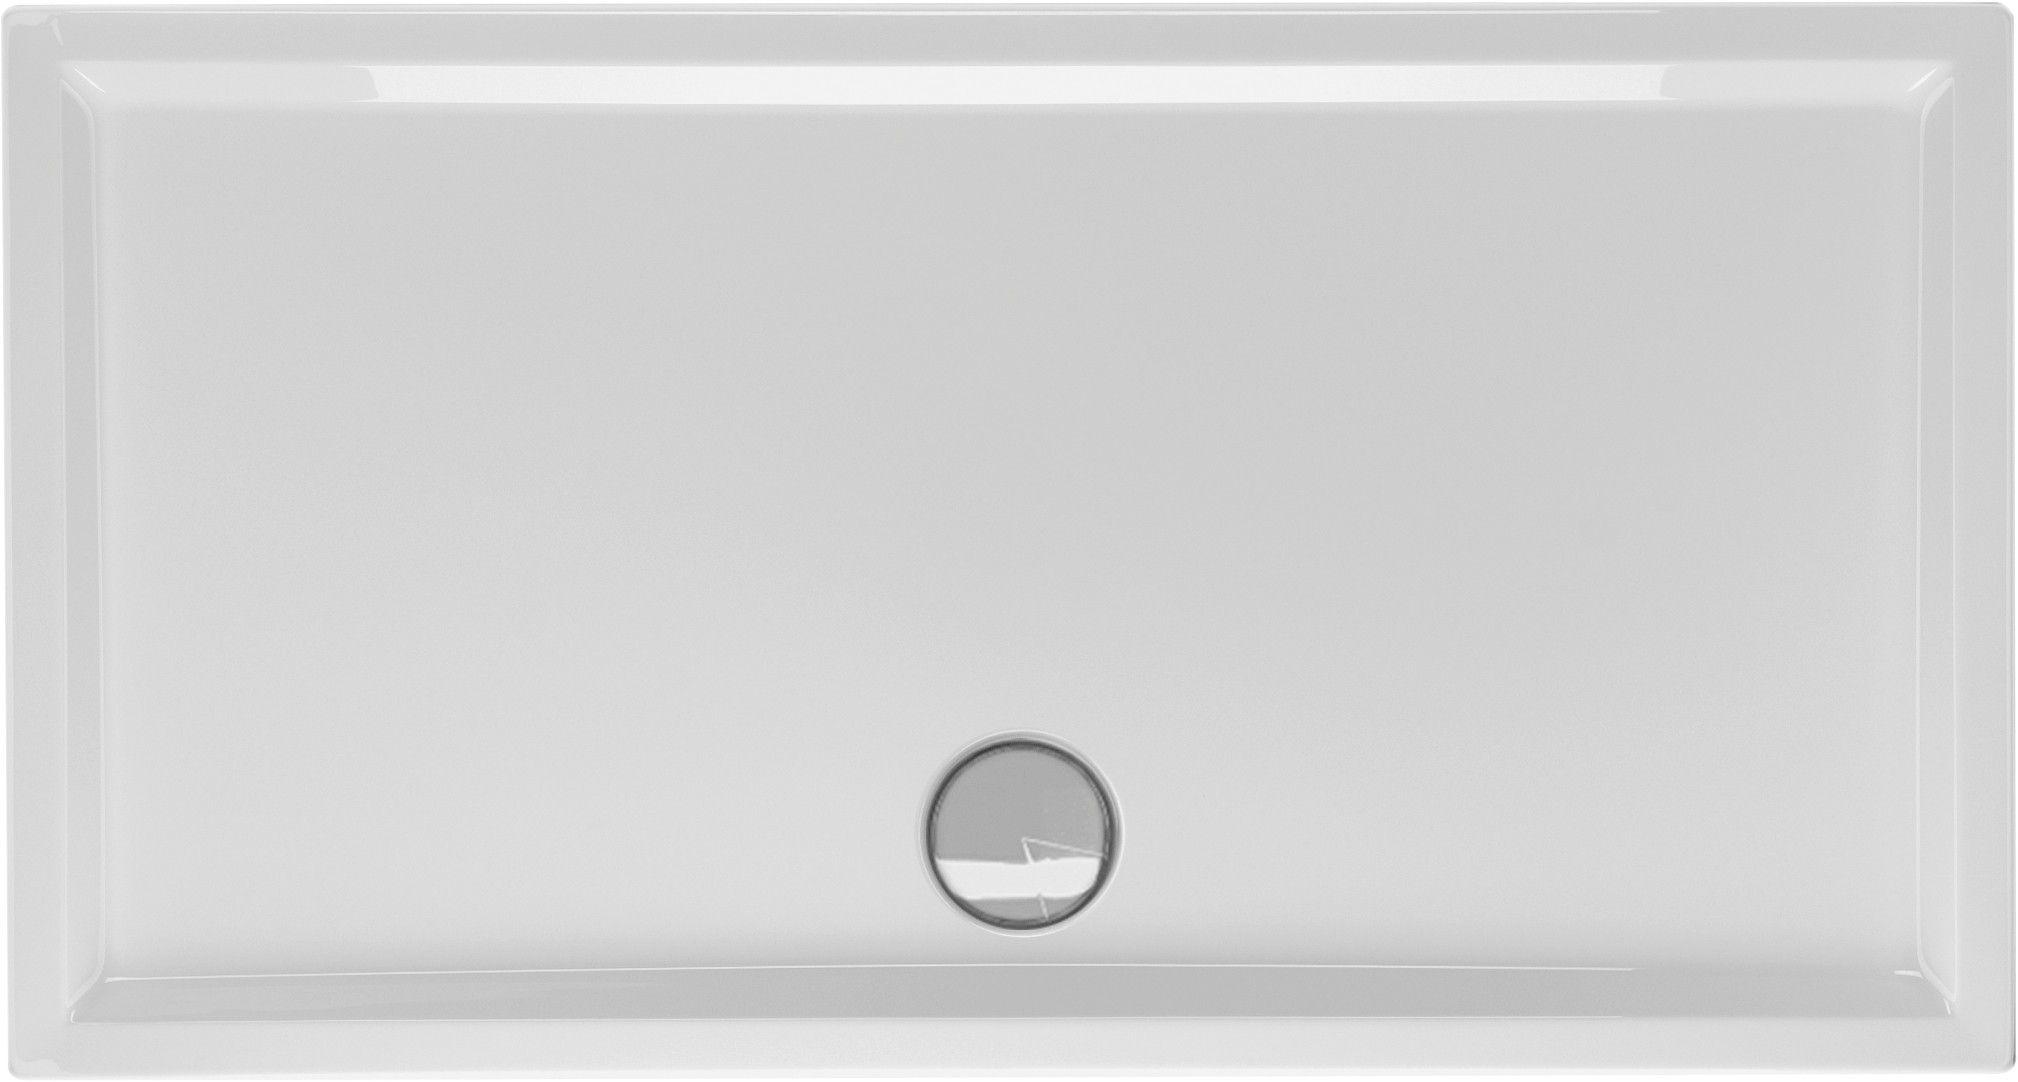 Duschwanne flach 150 x 80 x 4 cm Duschwanne, Duschwanne